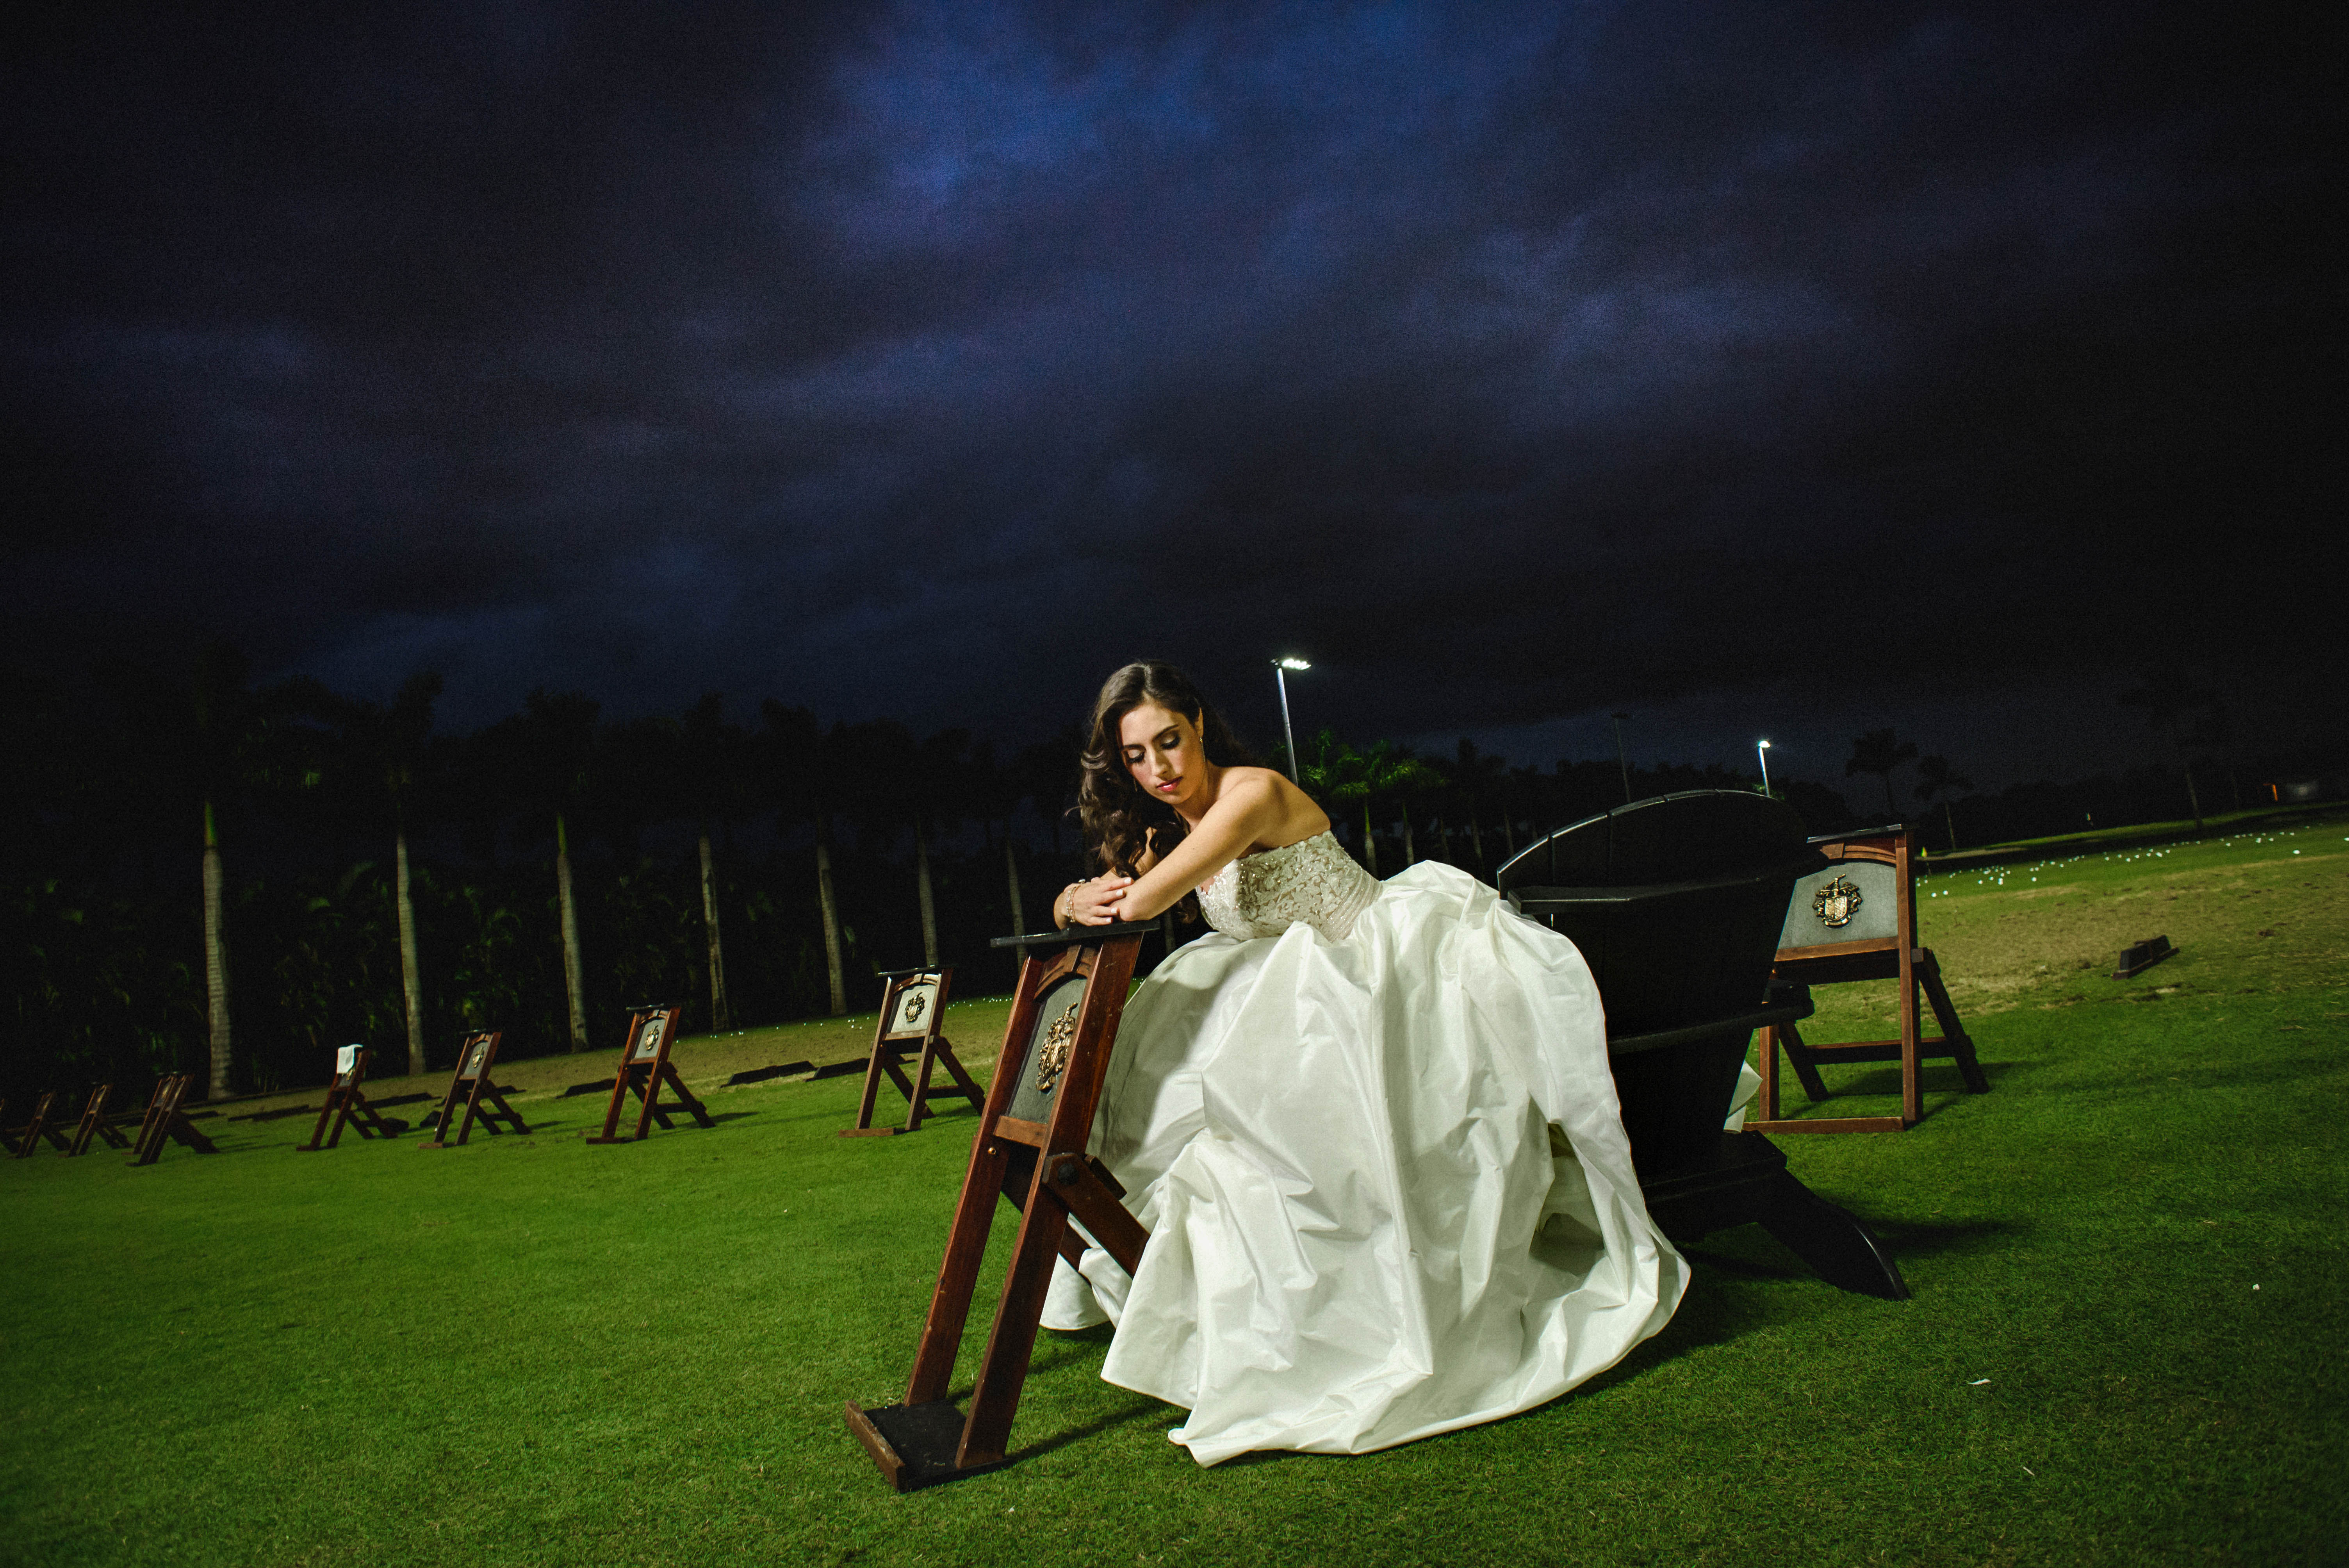 Seated bride under nighttime skies - photo by El Marco Rojo